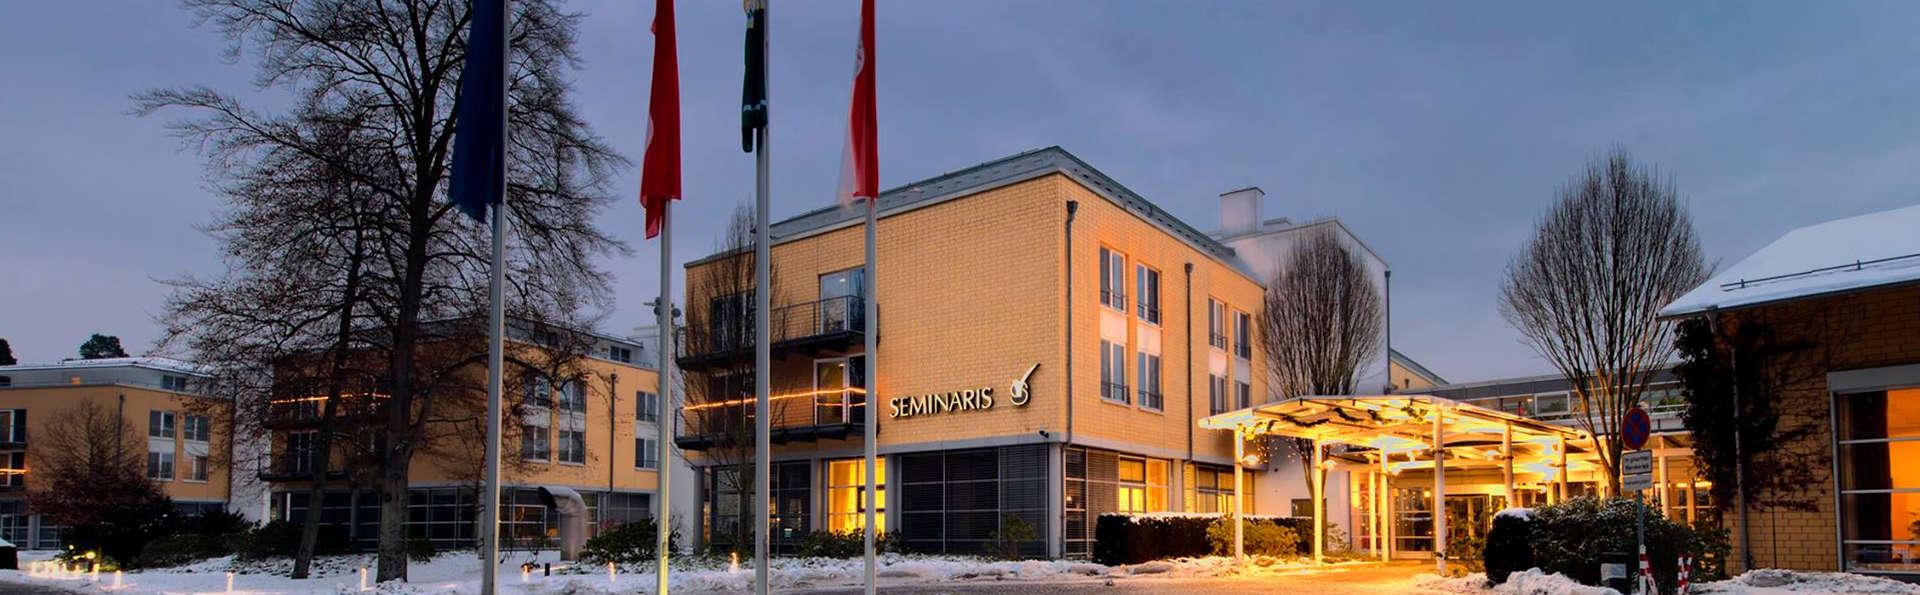 Seminaris Seehotel Potsdam - Edit_Front2.jpg